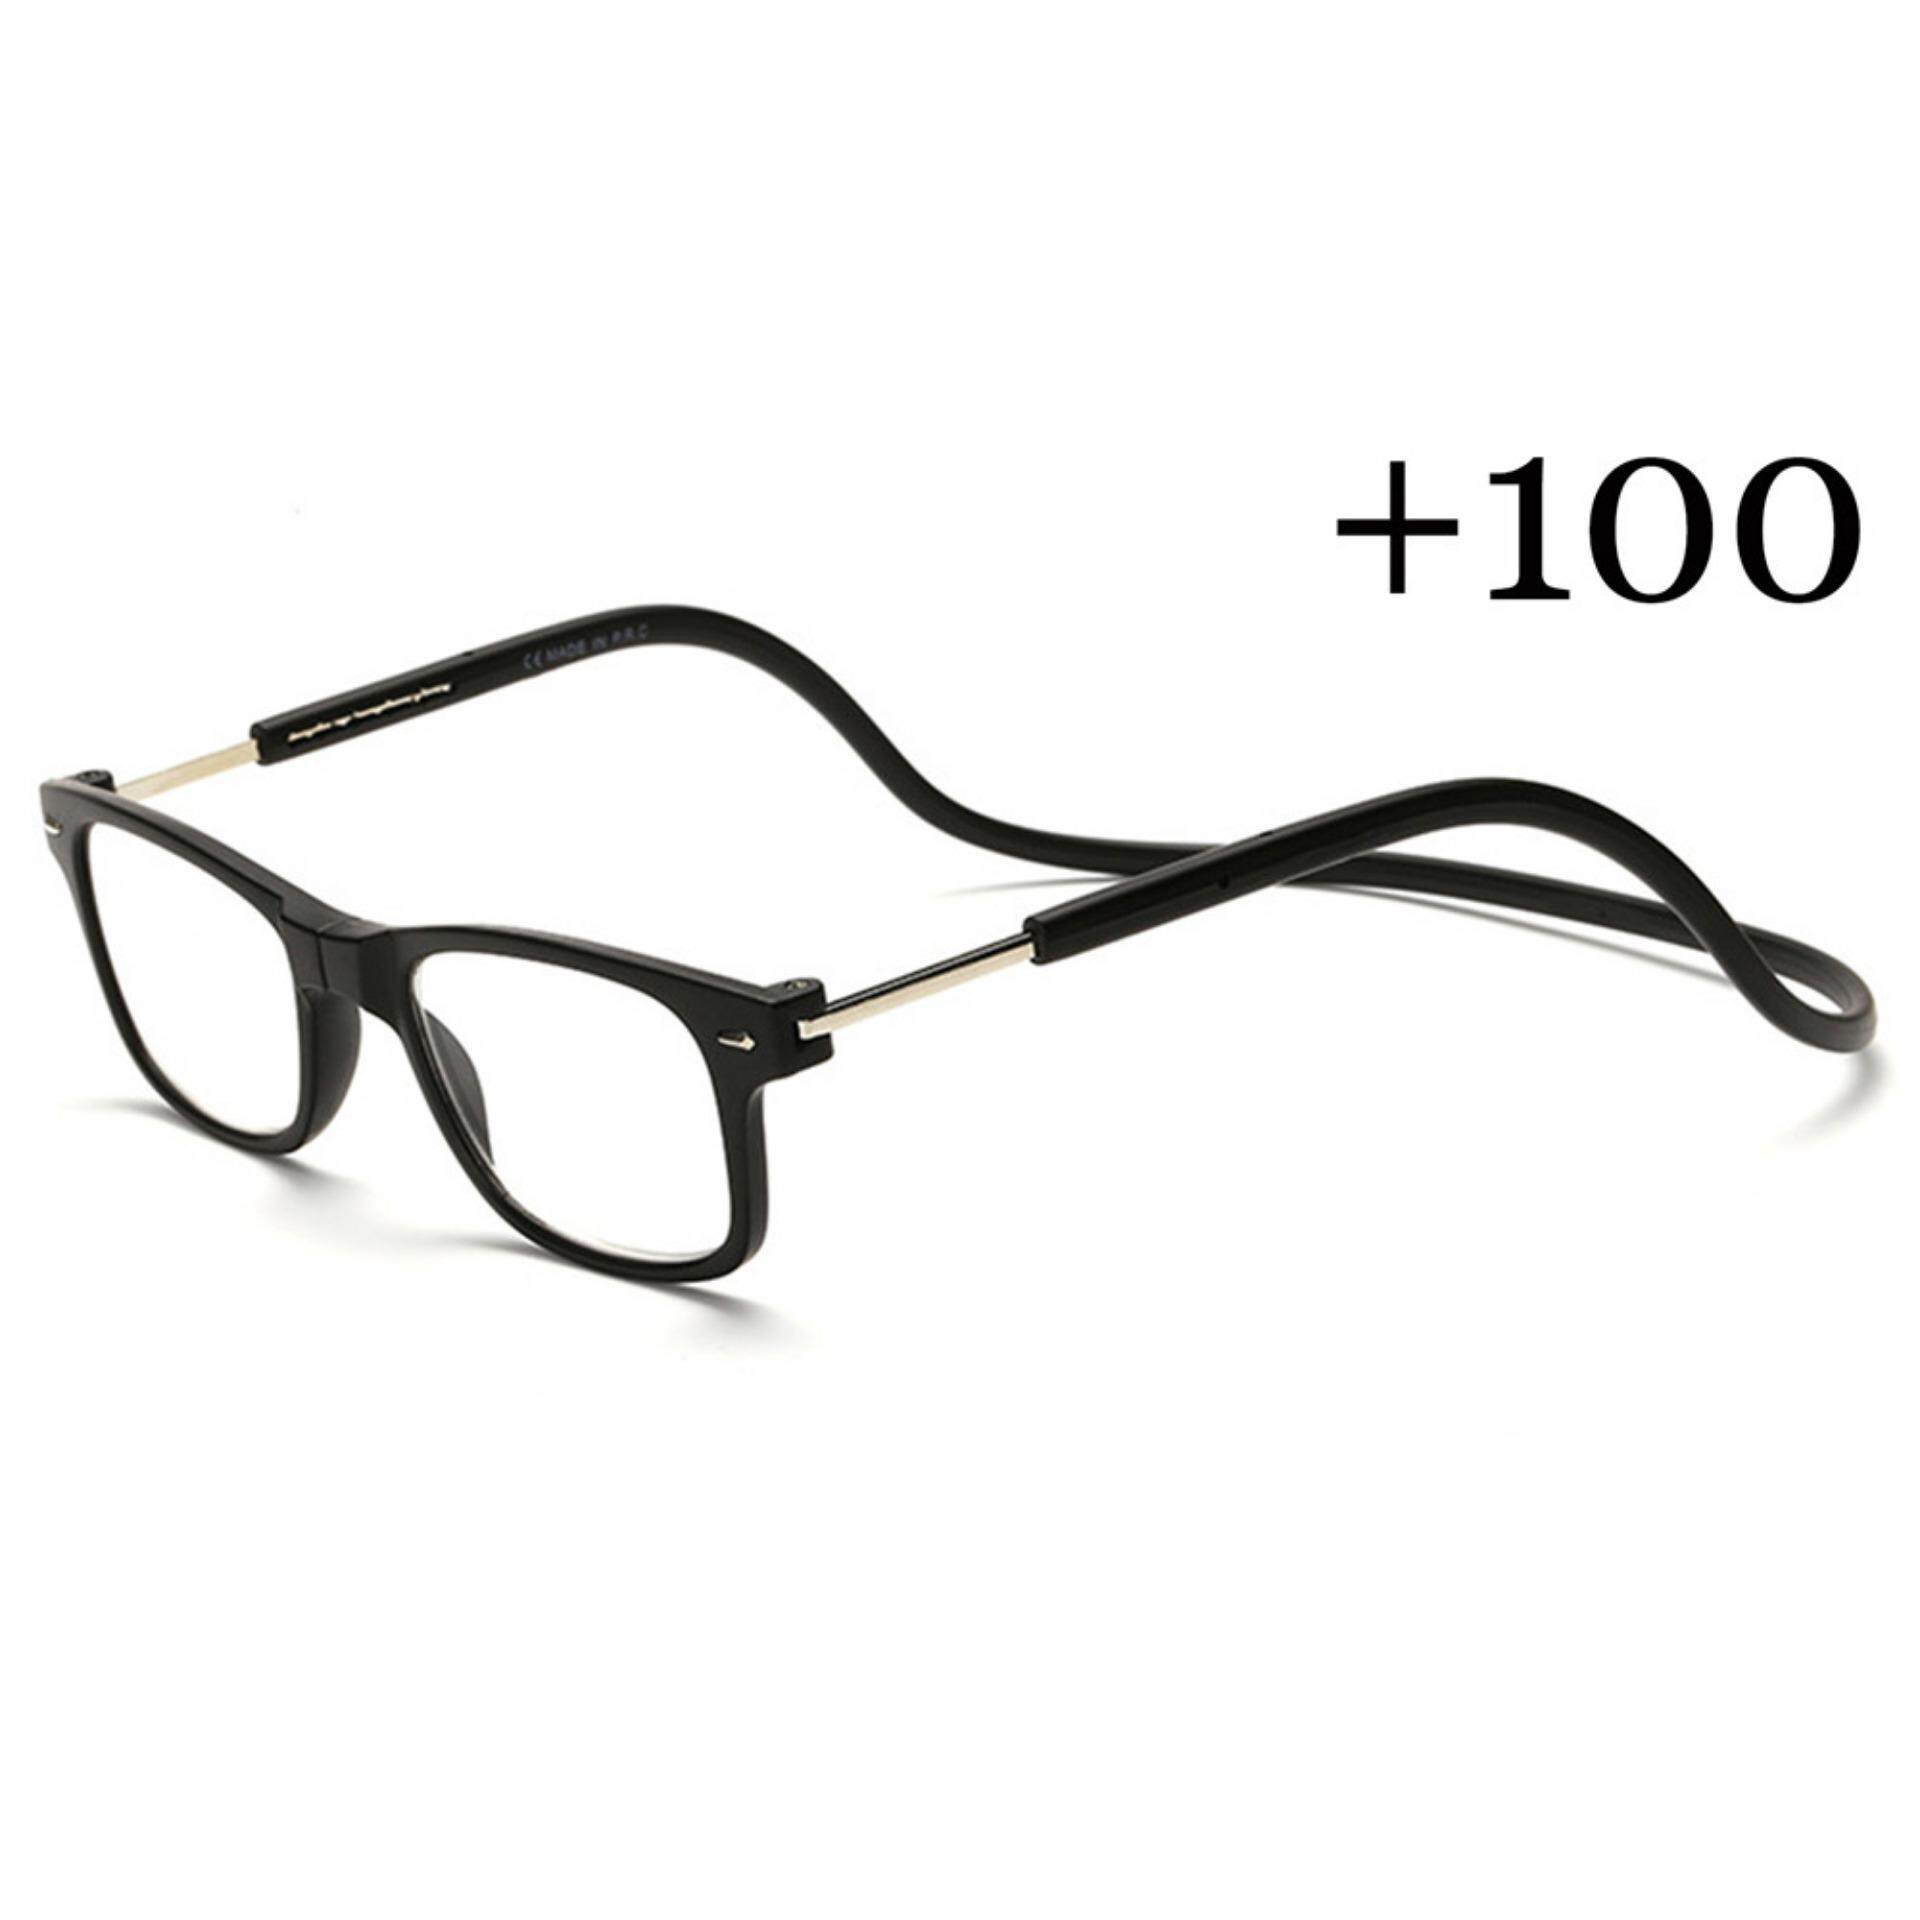 1f081fcb071 New Magnetic Folding Readers Reading Glasses +1.00 Neck Hang Unisex Black